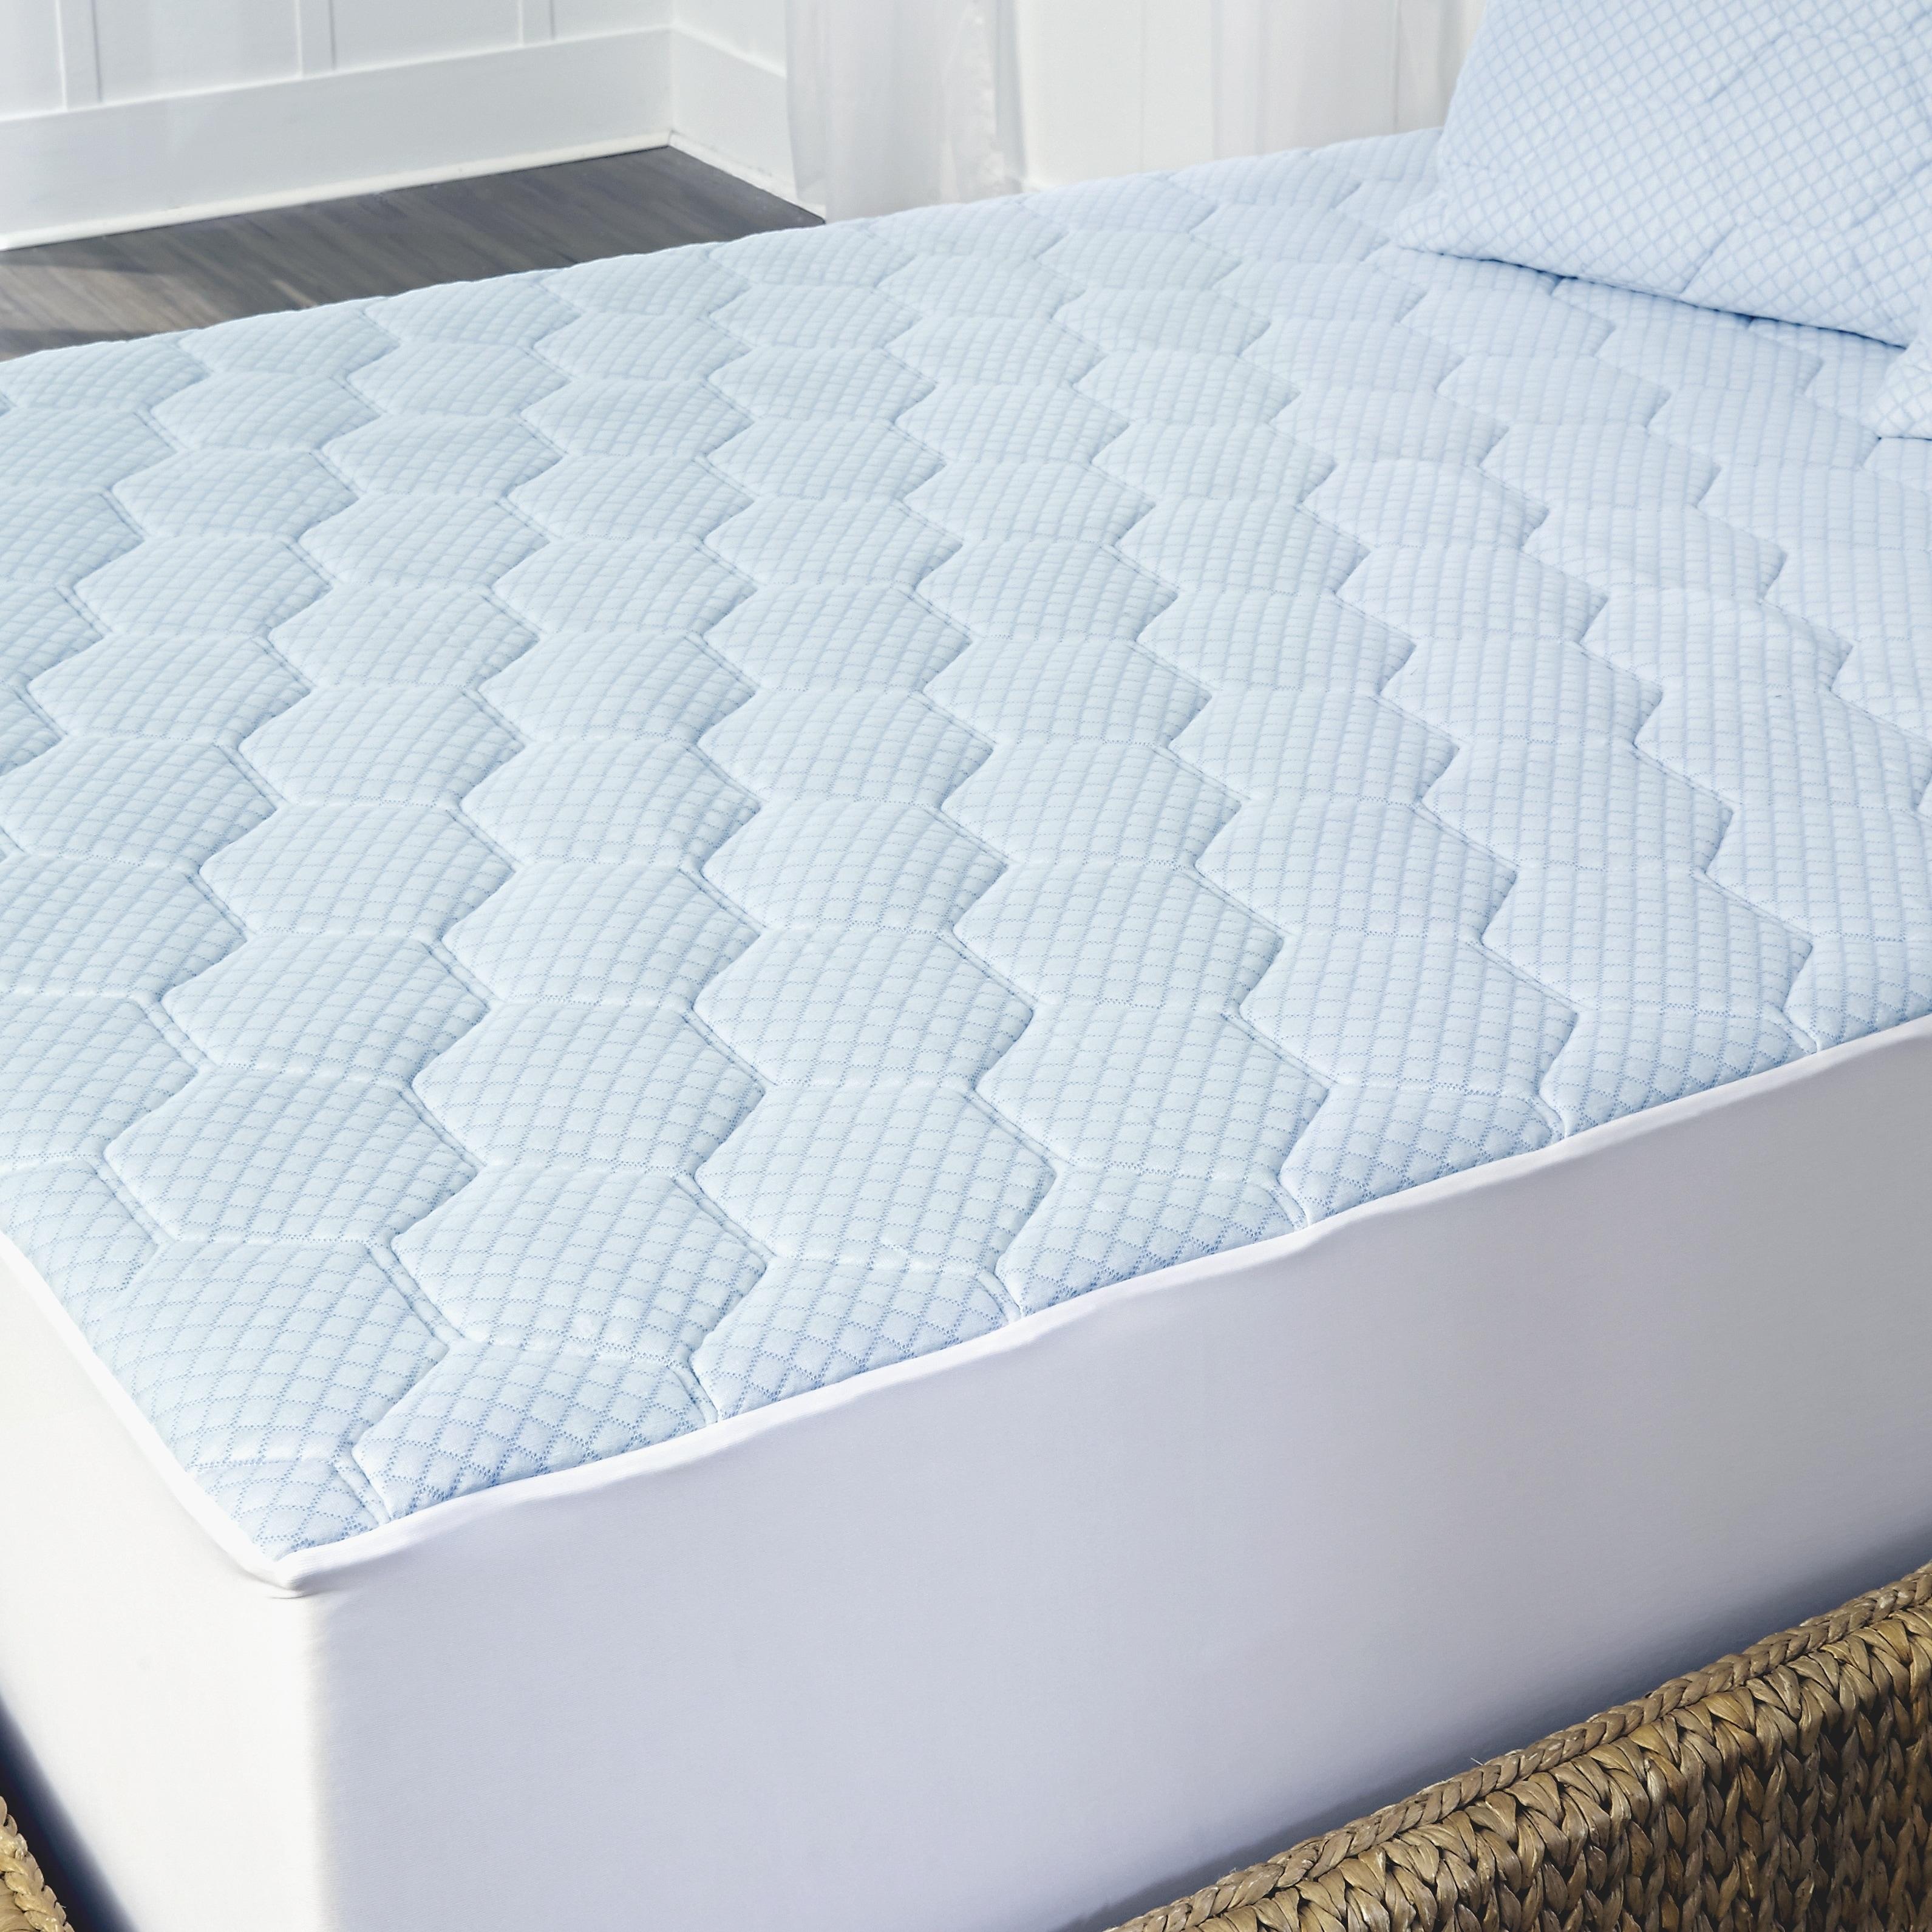 Arctic Sleep Cooling Gel Memory Foam Mattress Topper With Skirt On Sale Overstock 28040758